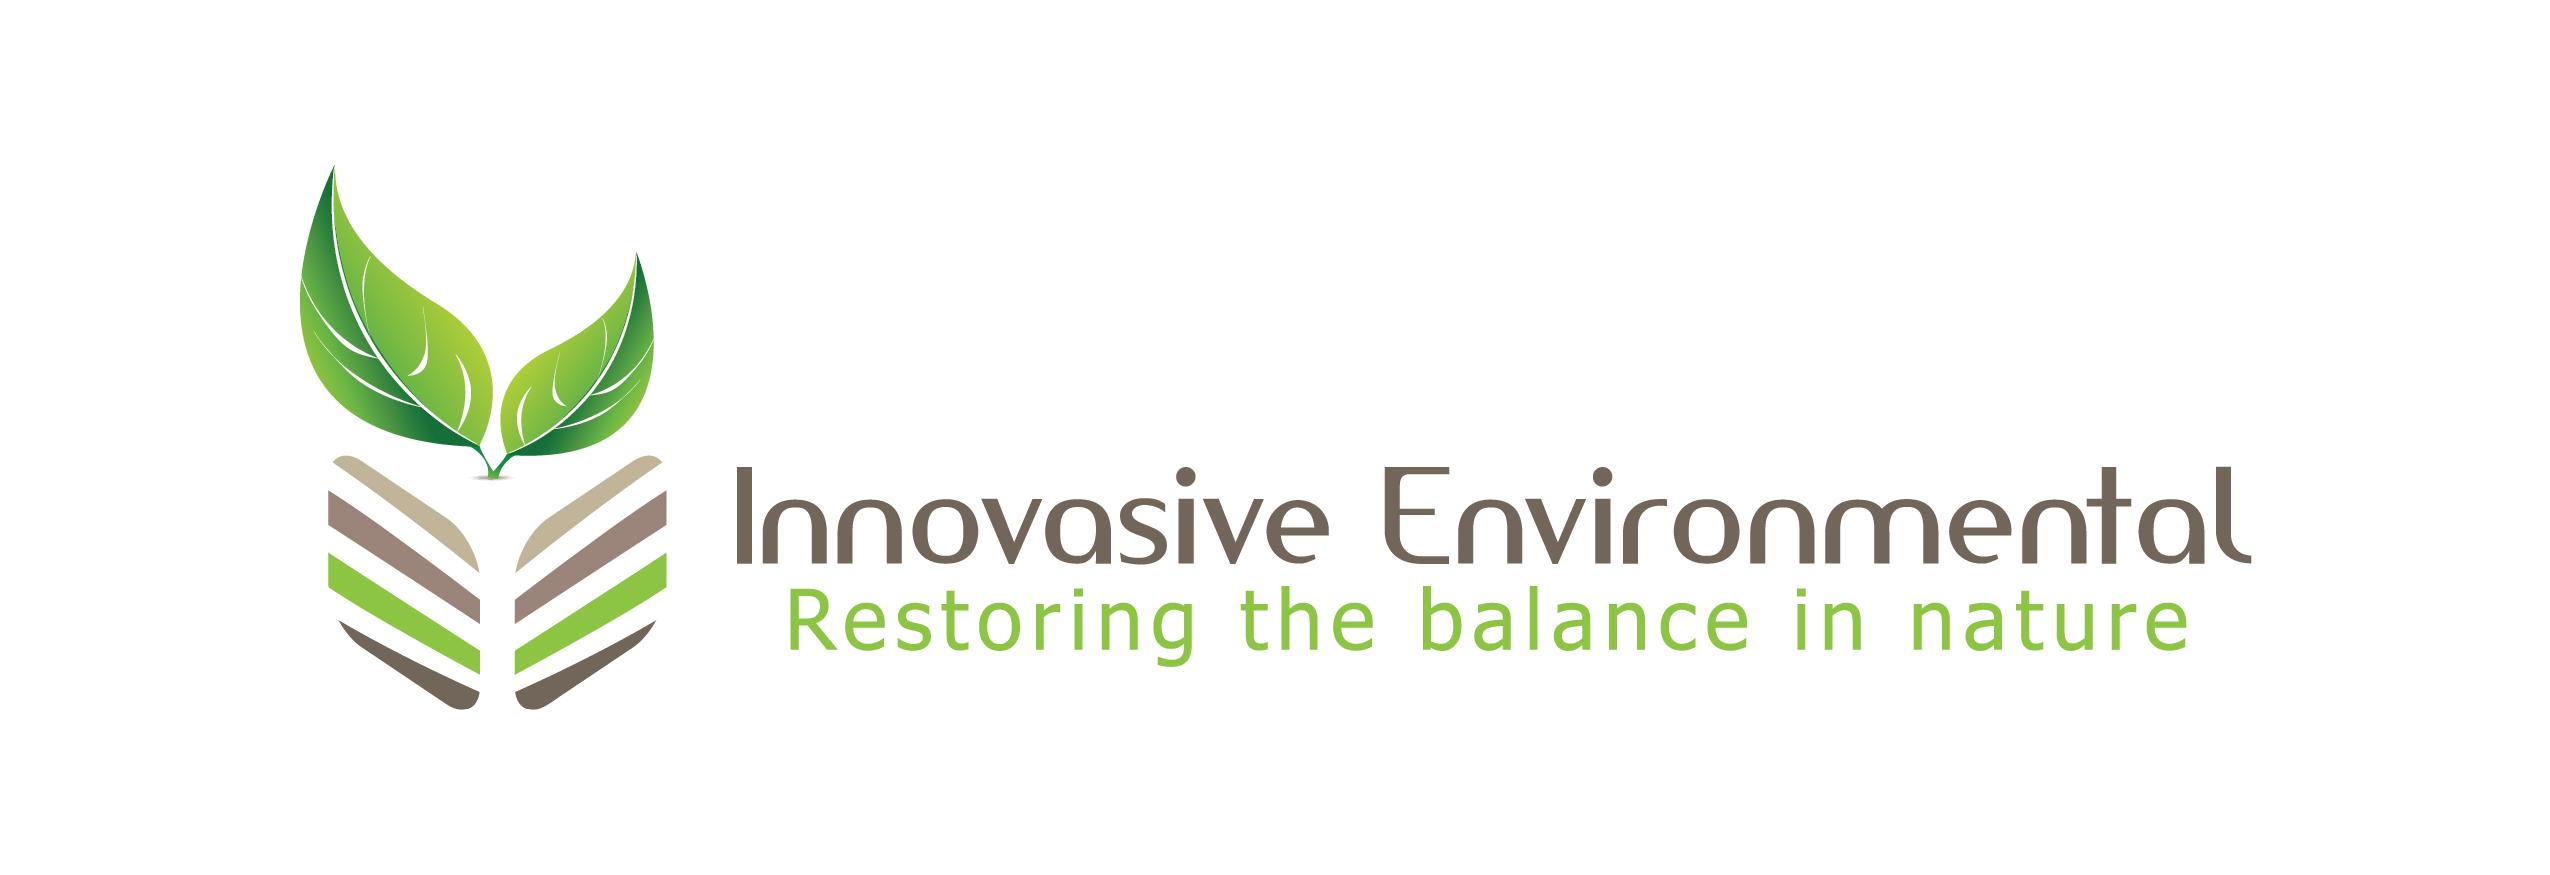 Innovasive Logo